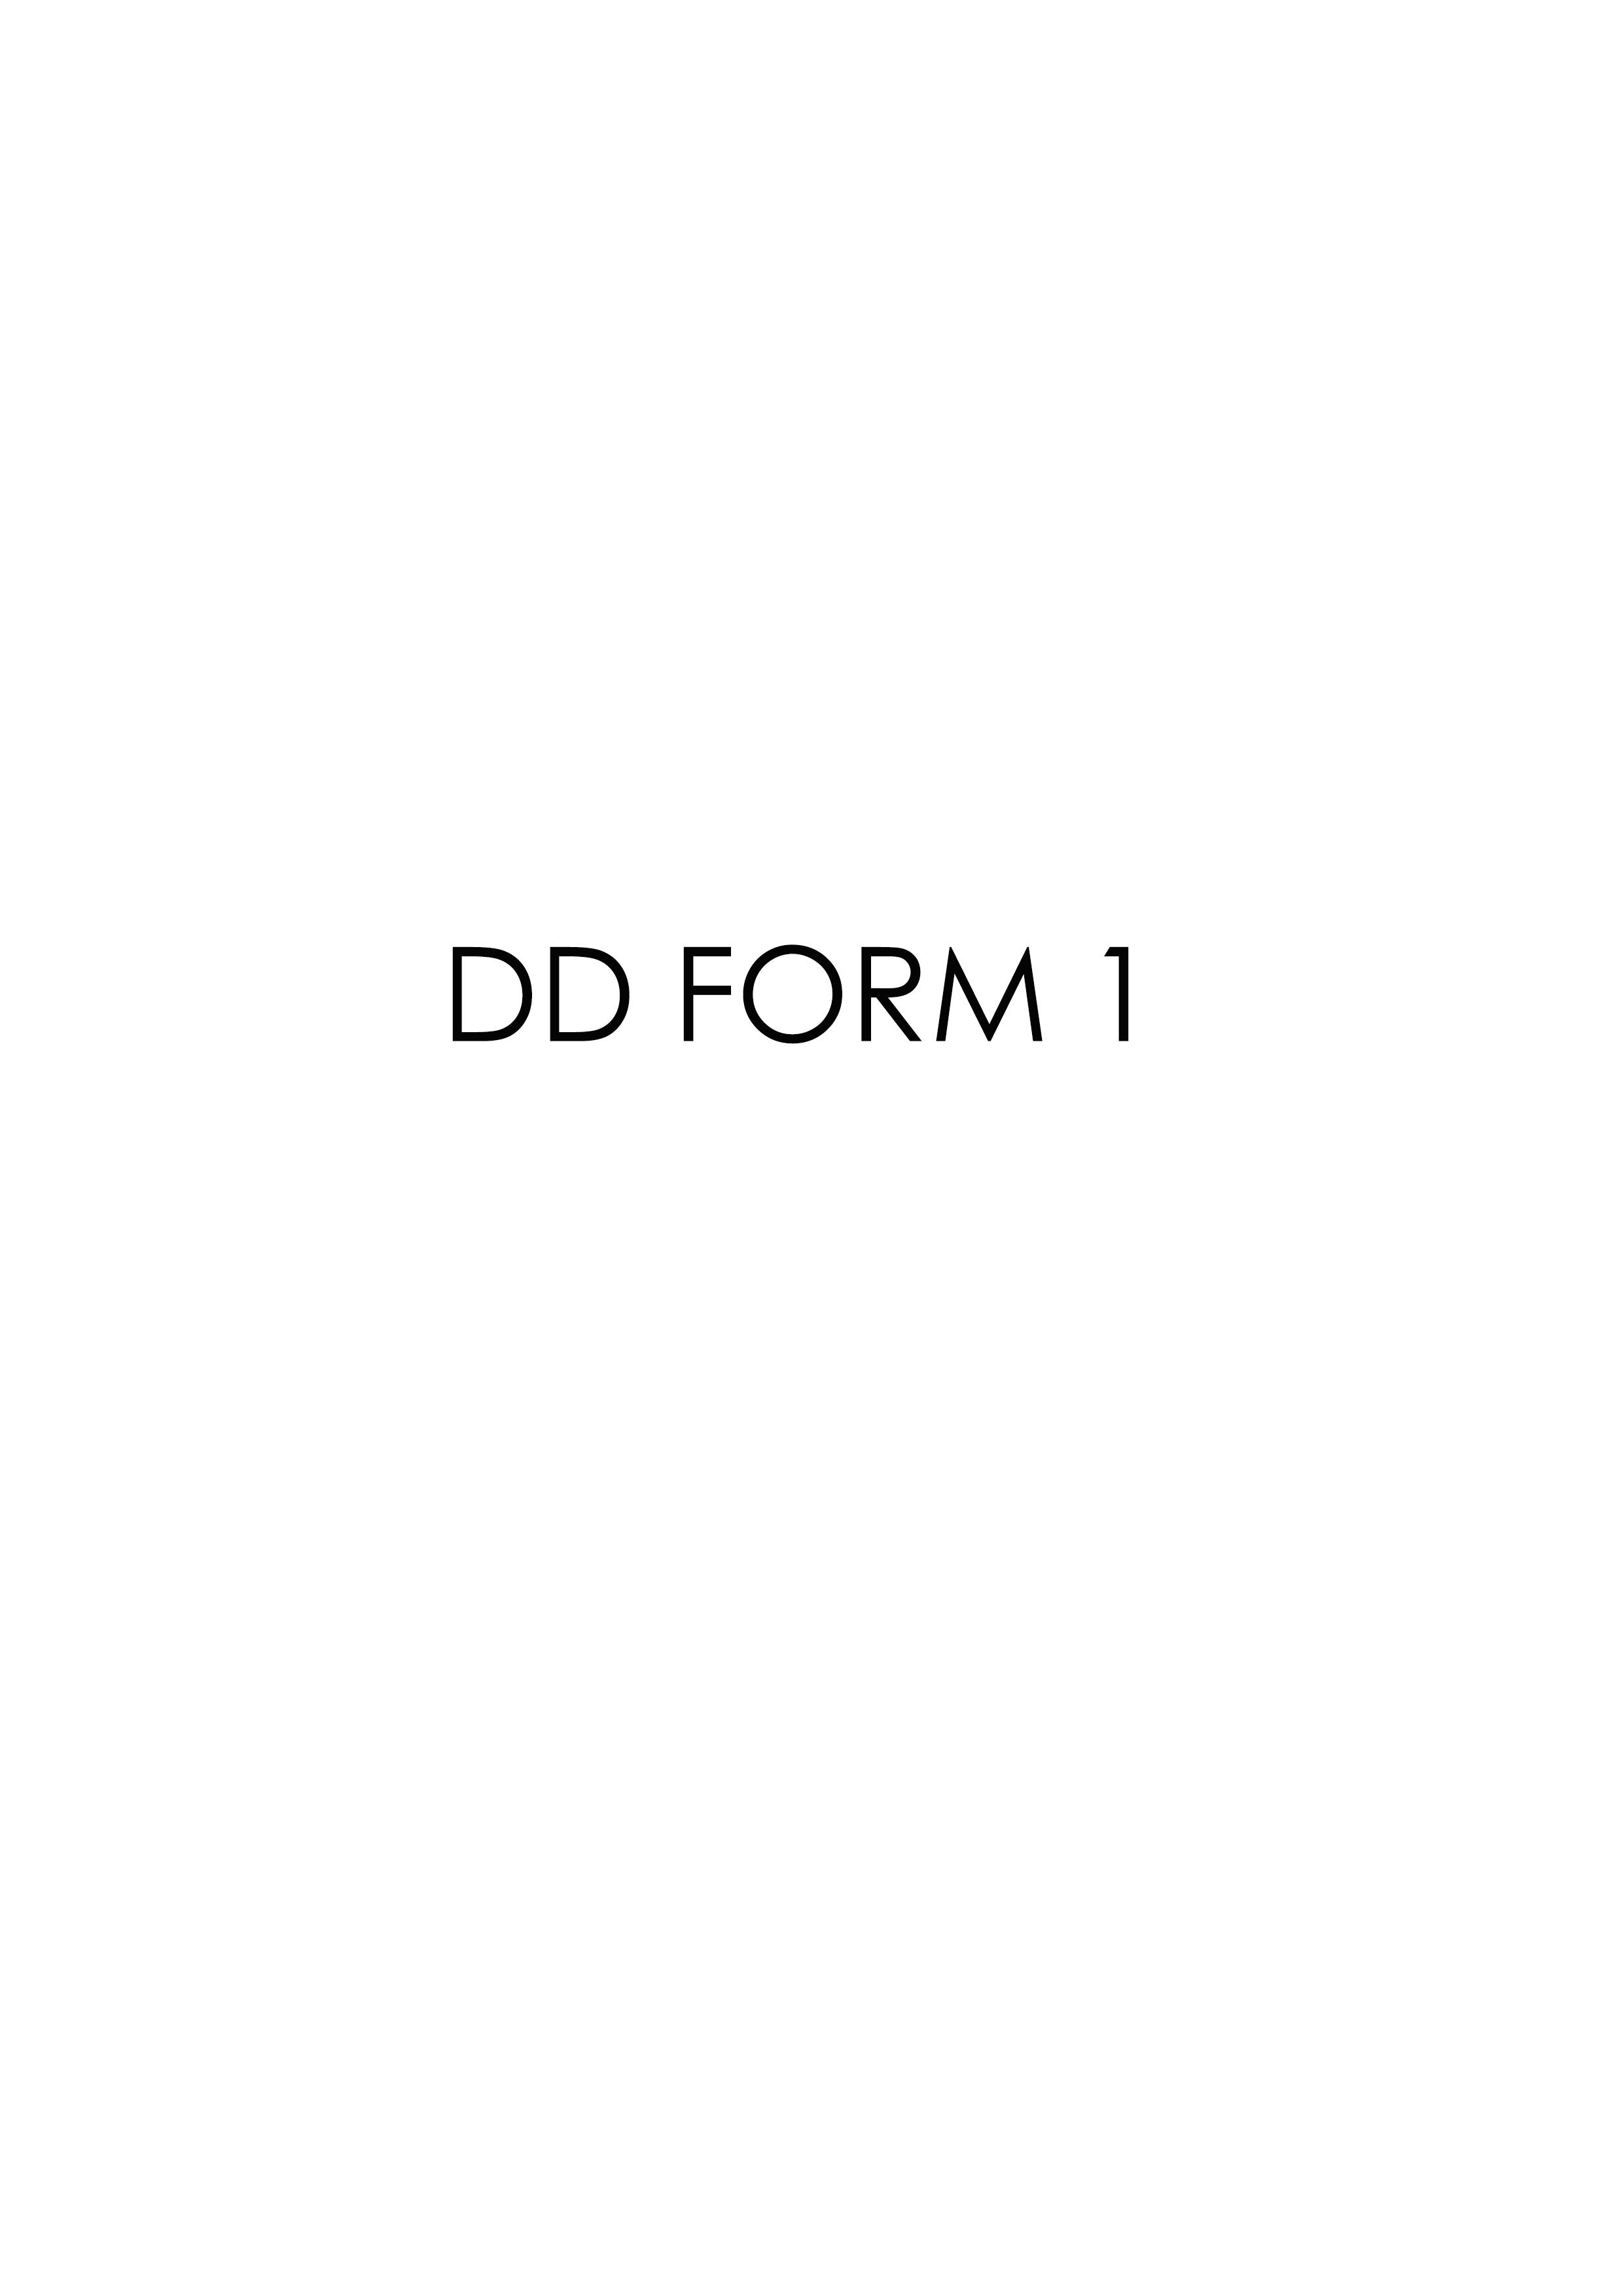 Download dd Form 1 Free